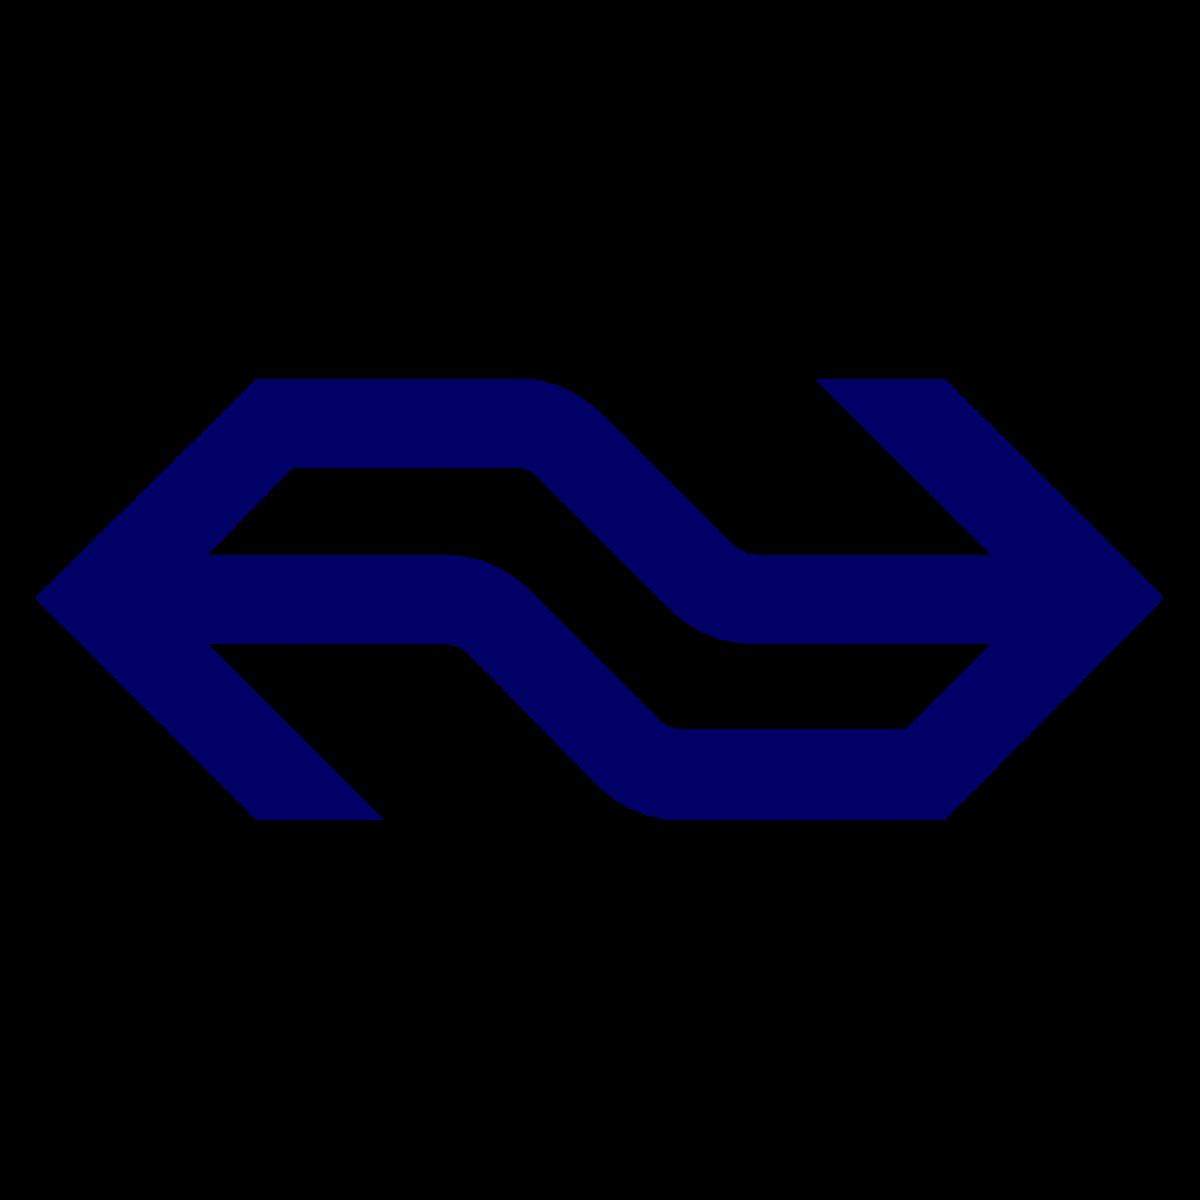 UX Design Nederlandse Spoorwegen NS logo